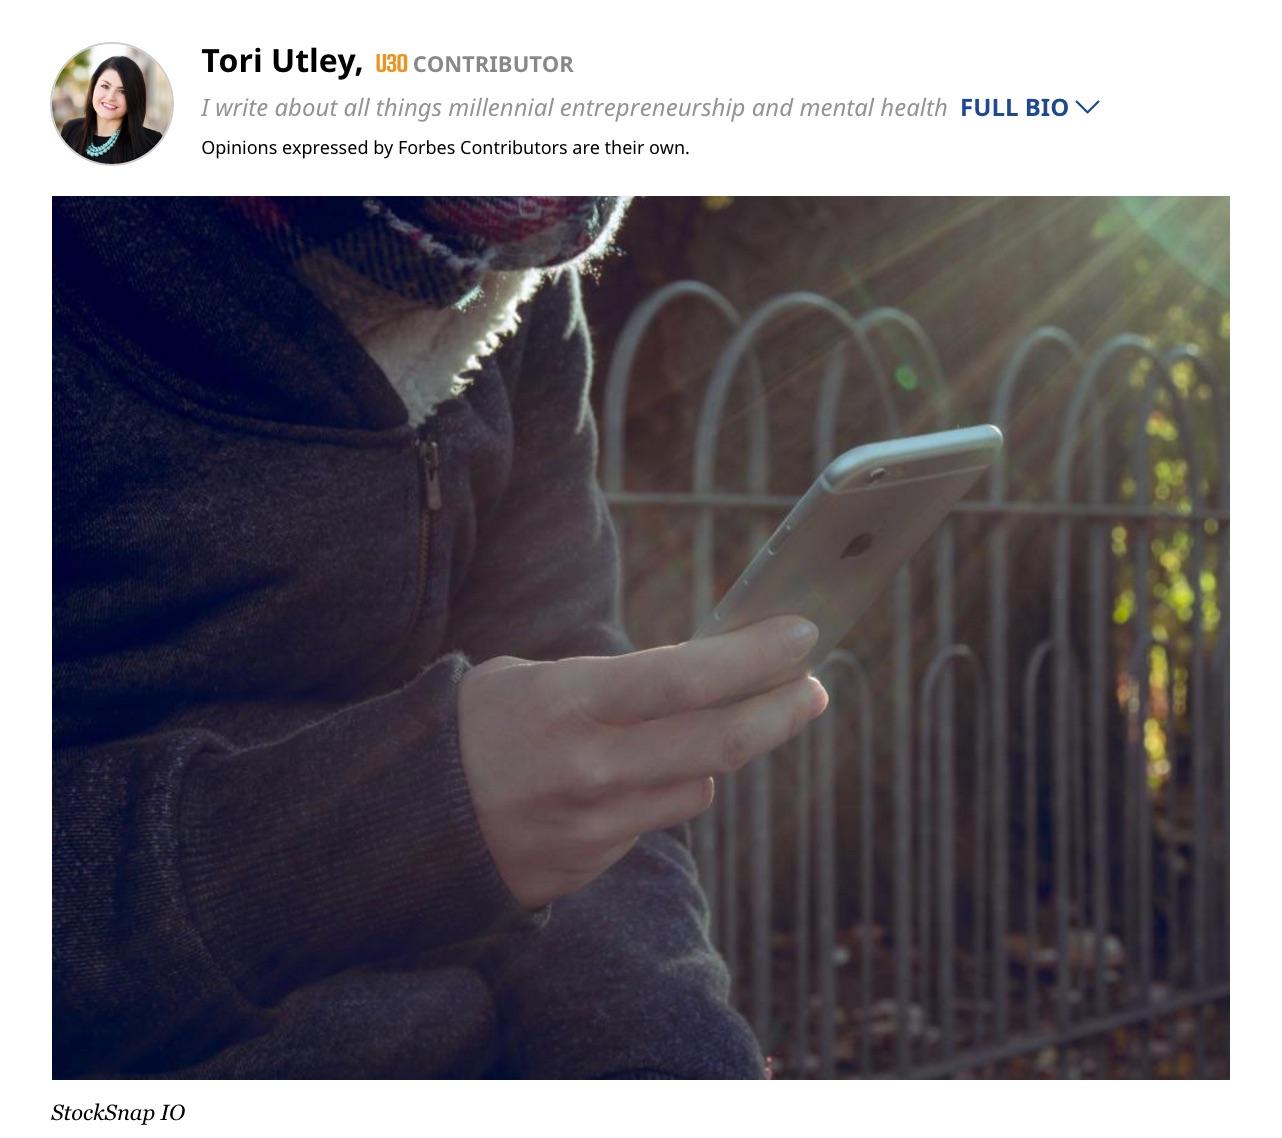 Picking a Mental Health Mobile App